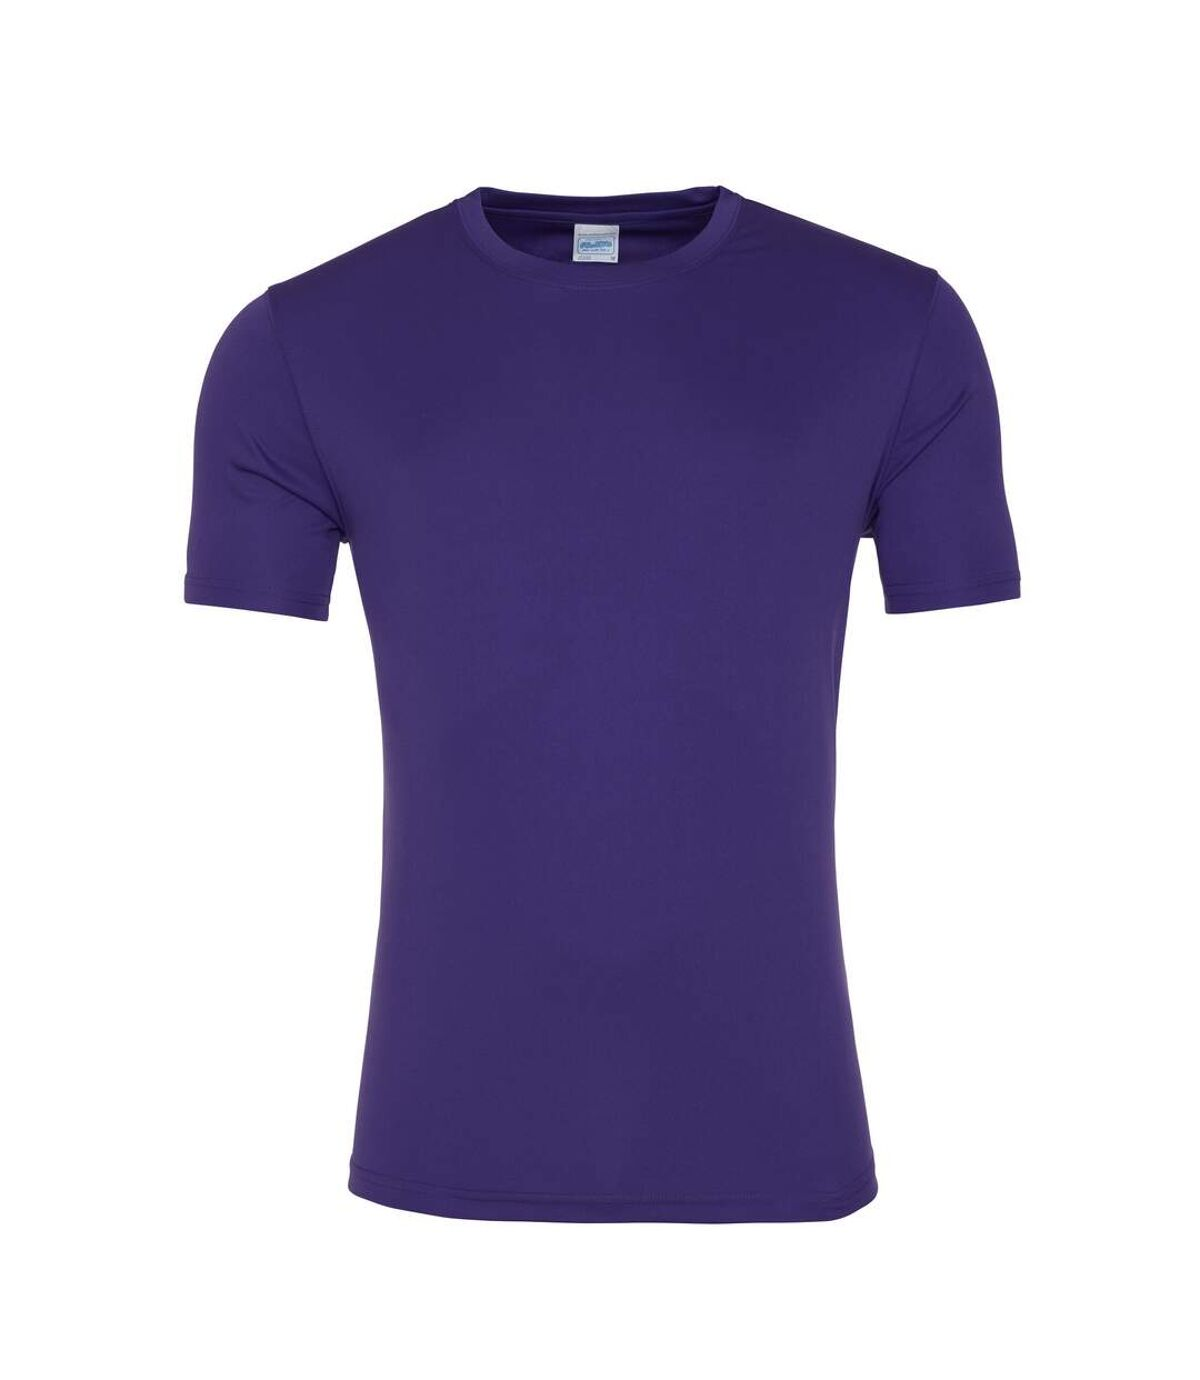 AWDis Just Cool Mens Smooth Short Sleeve T-Shirt (Purple) - UTRW5357